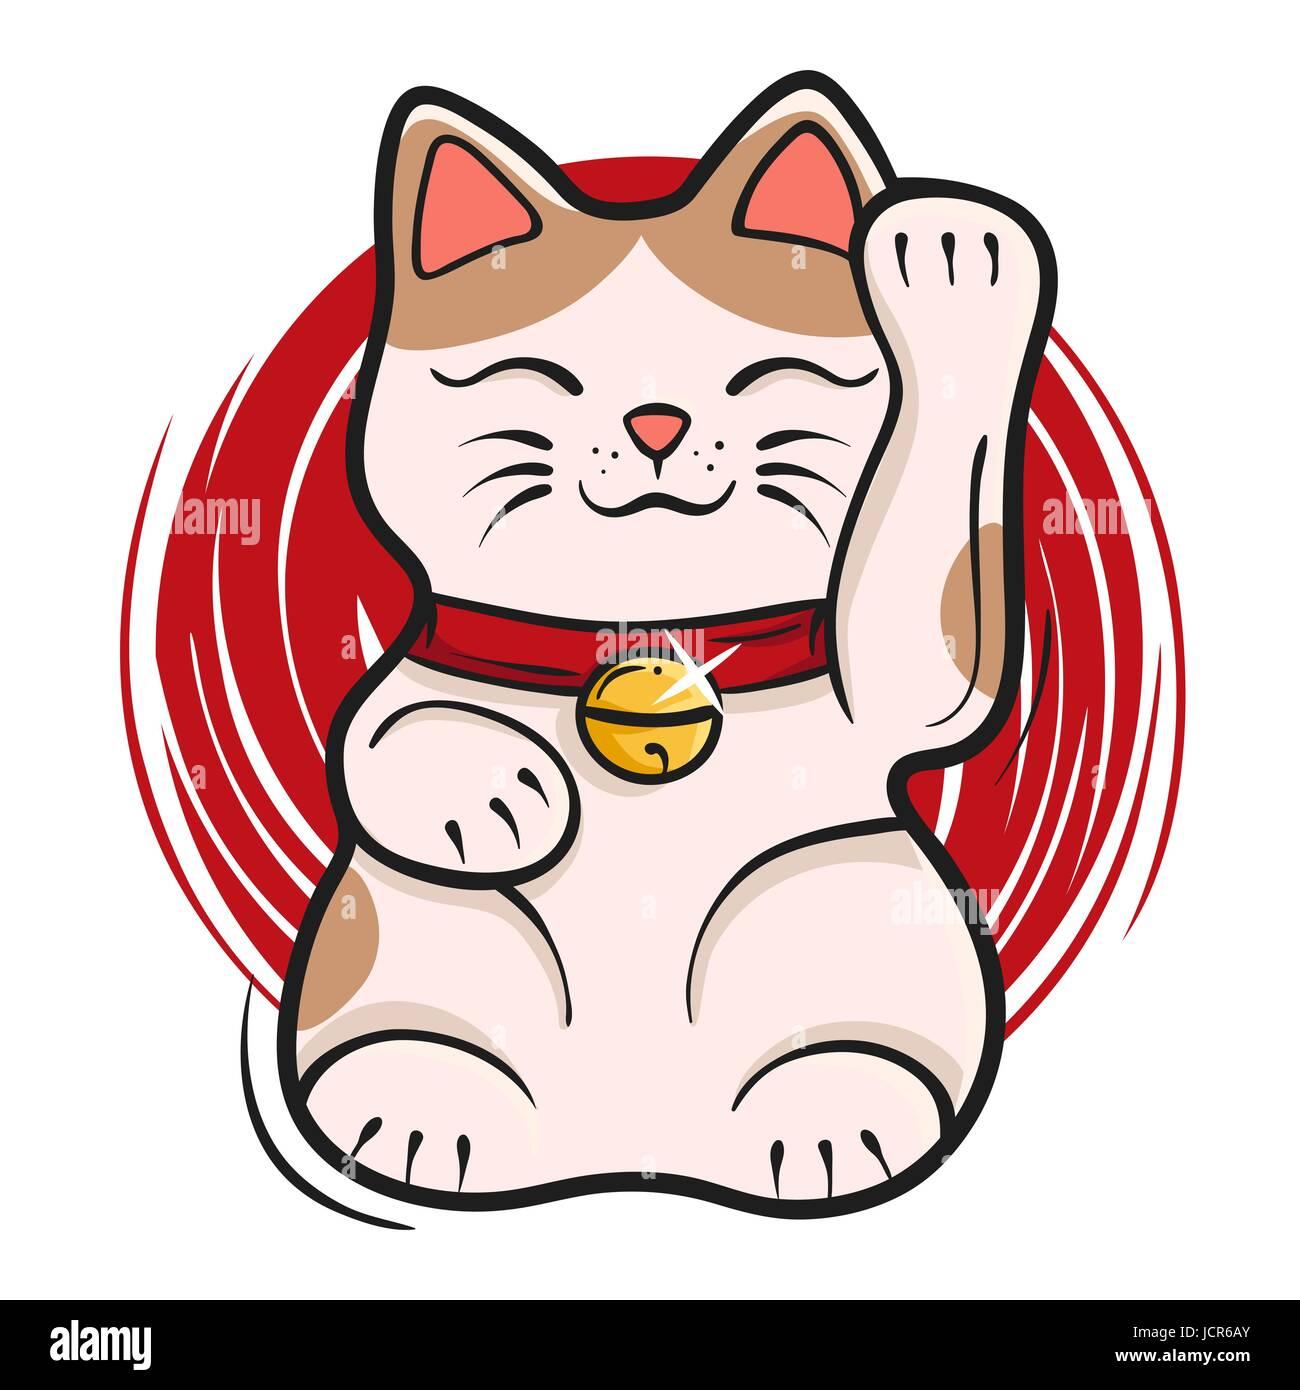 Vector Illustration Of Maneki Neko Japanese Lucky Cat Fortune